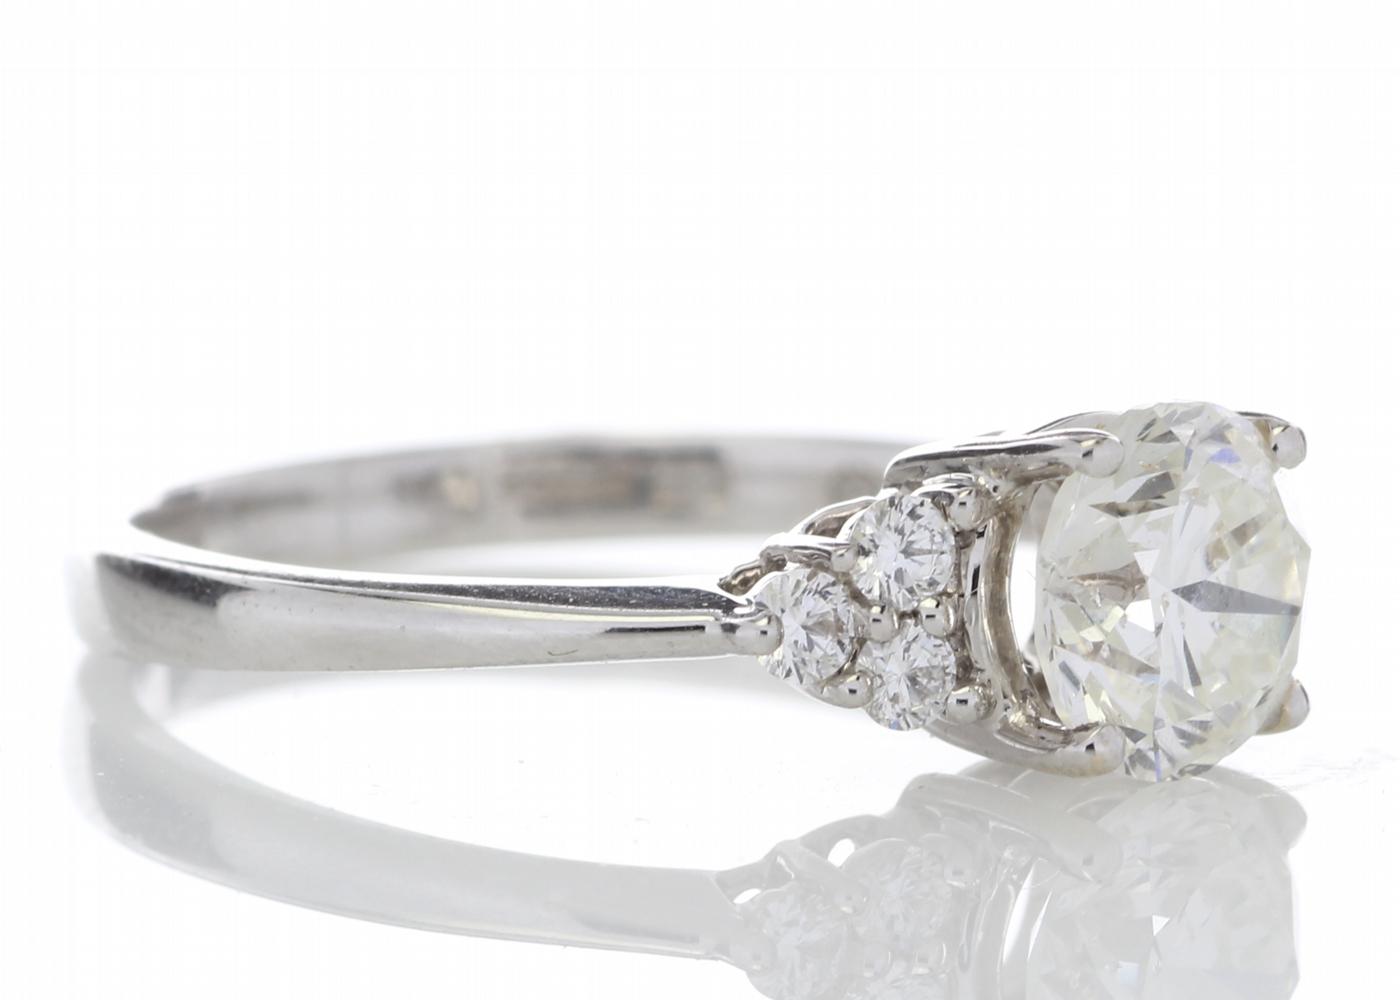 18ct White Gold Heart Shape Diamond Ring 1.29 Carats - Image 4 of 5